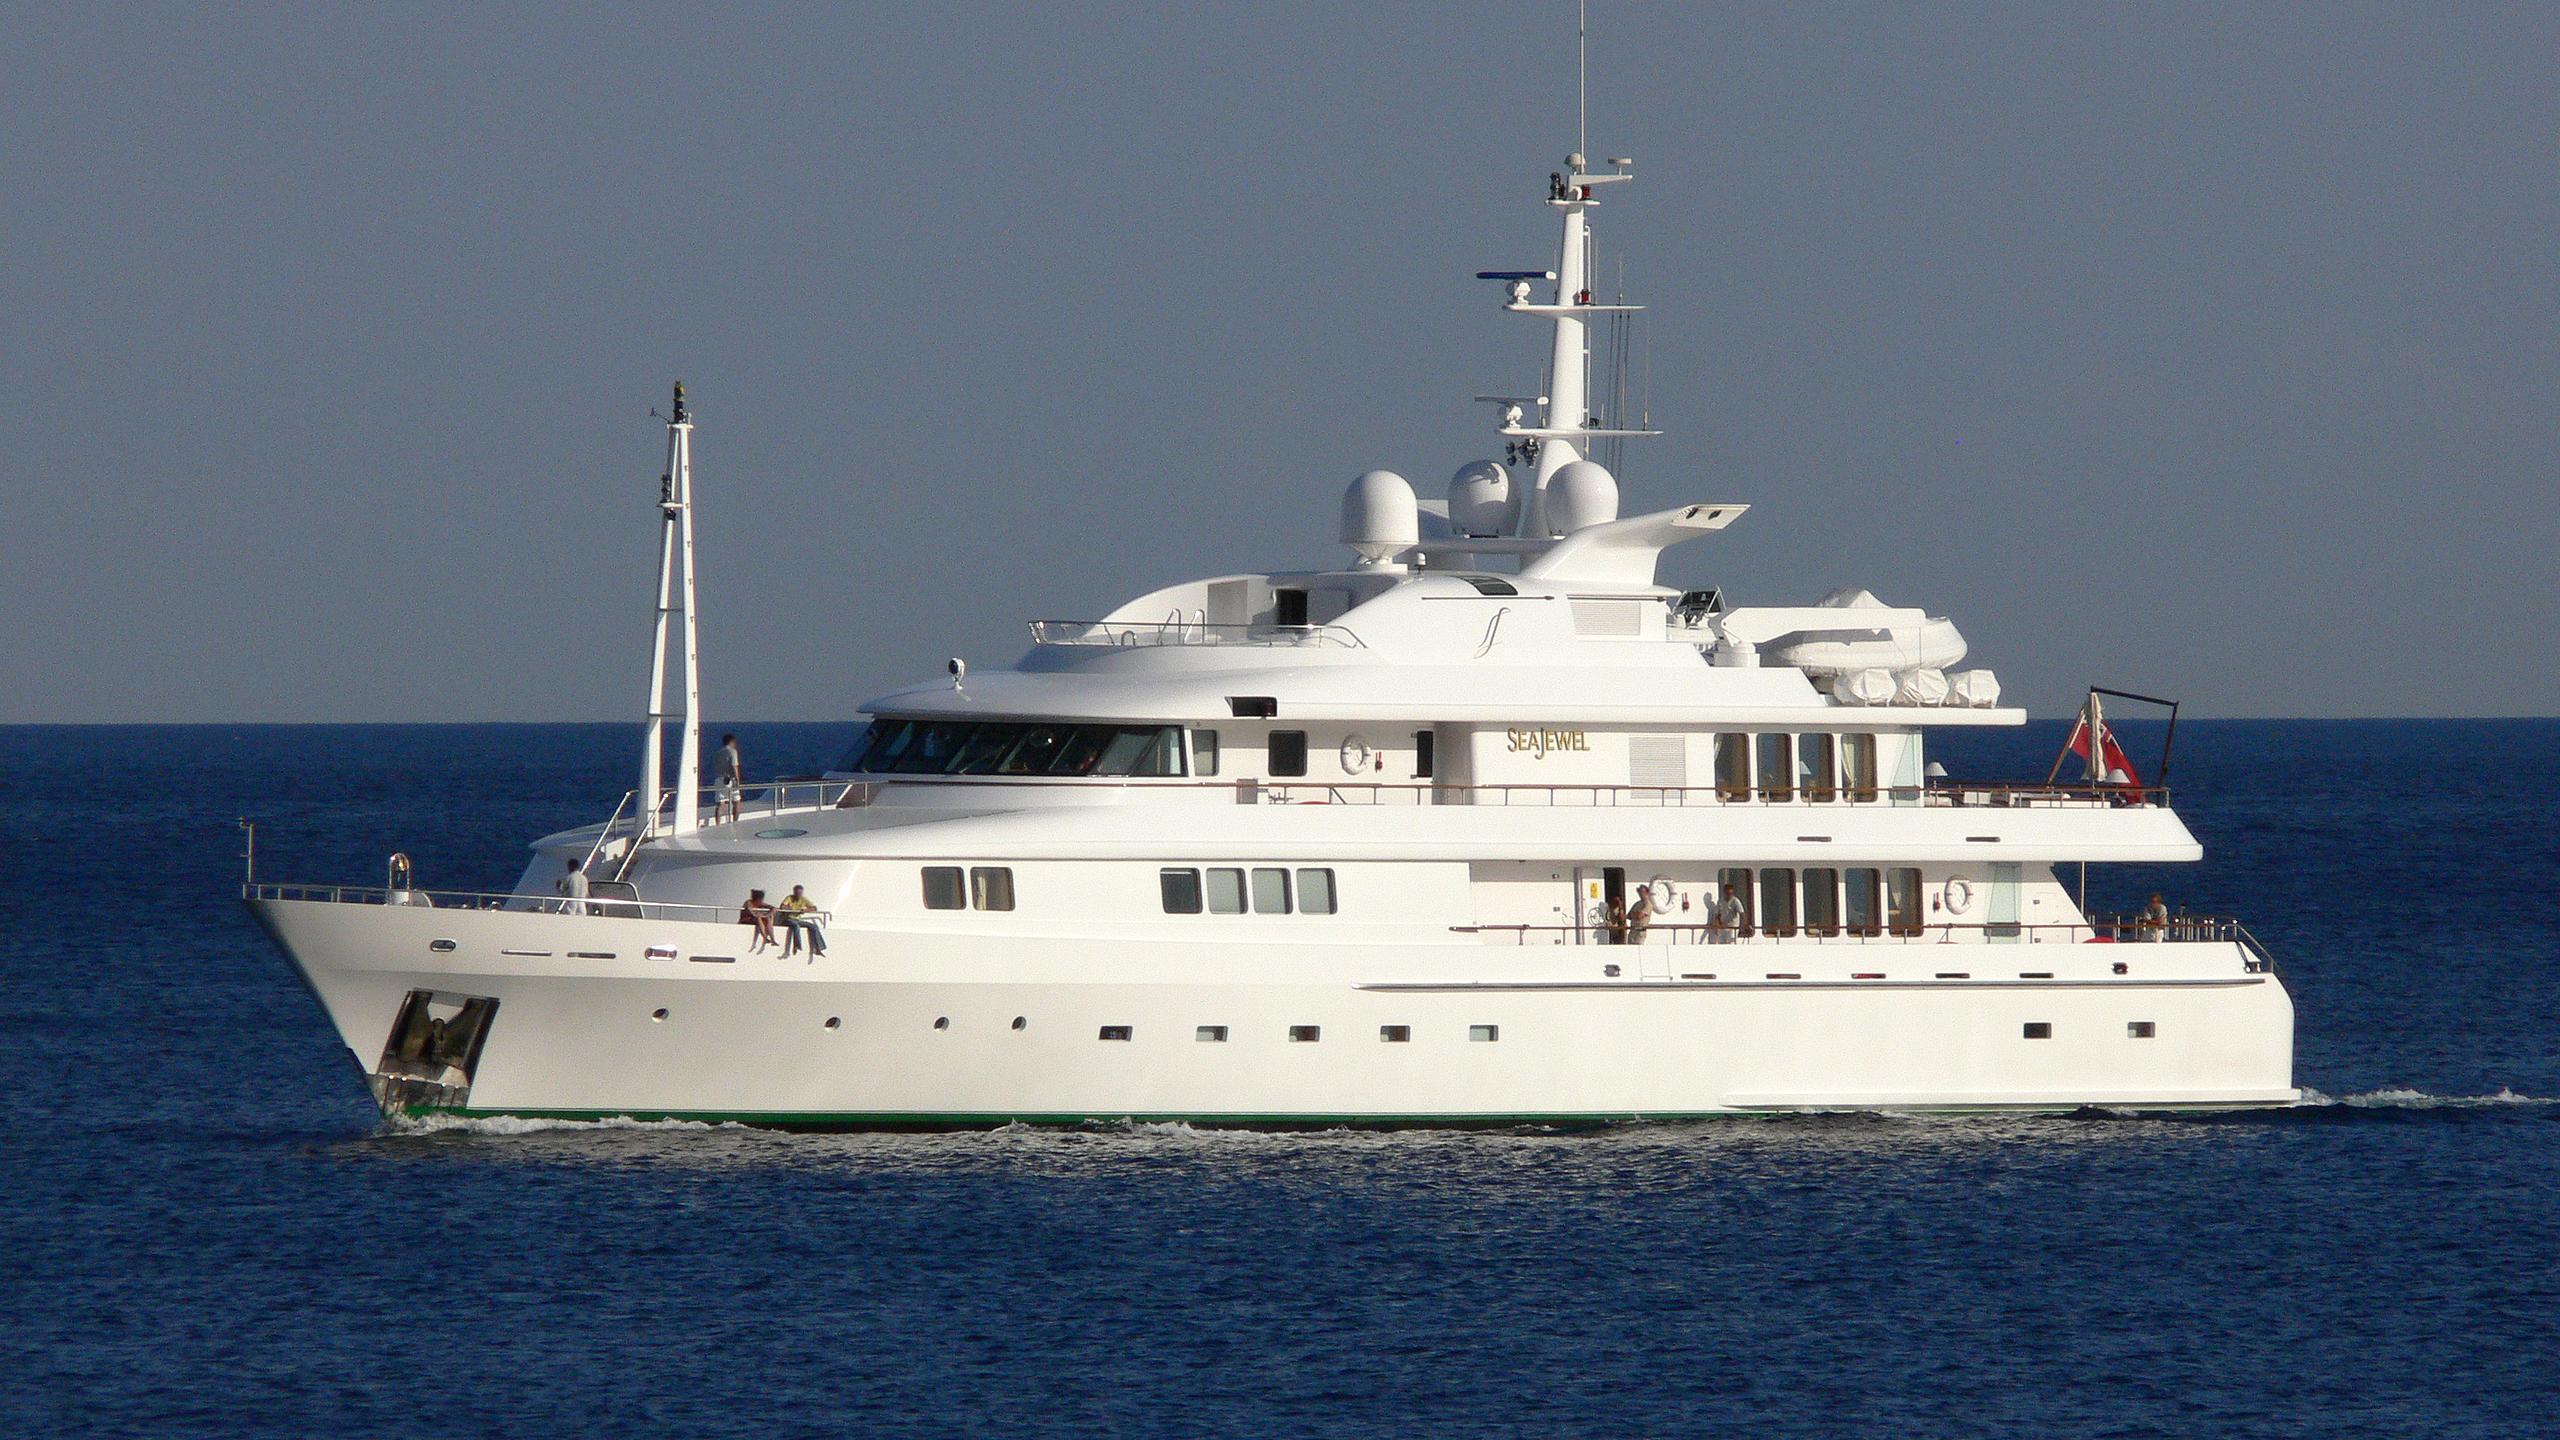 amore-mio-ii-yacht-exterior